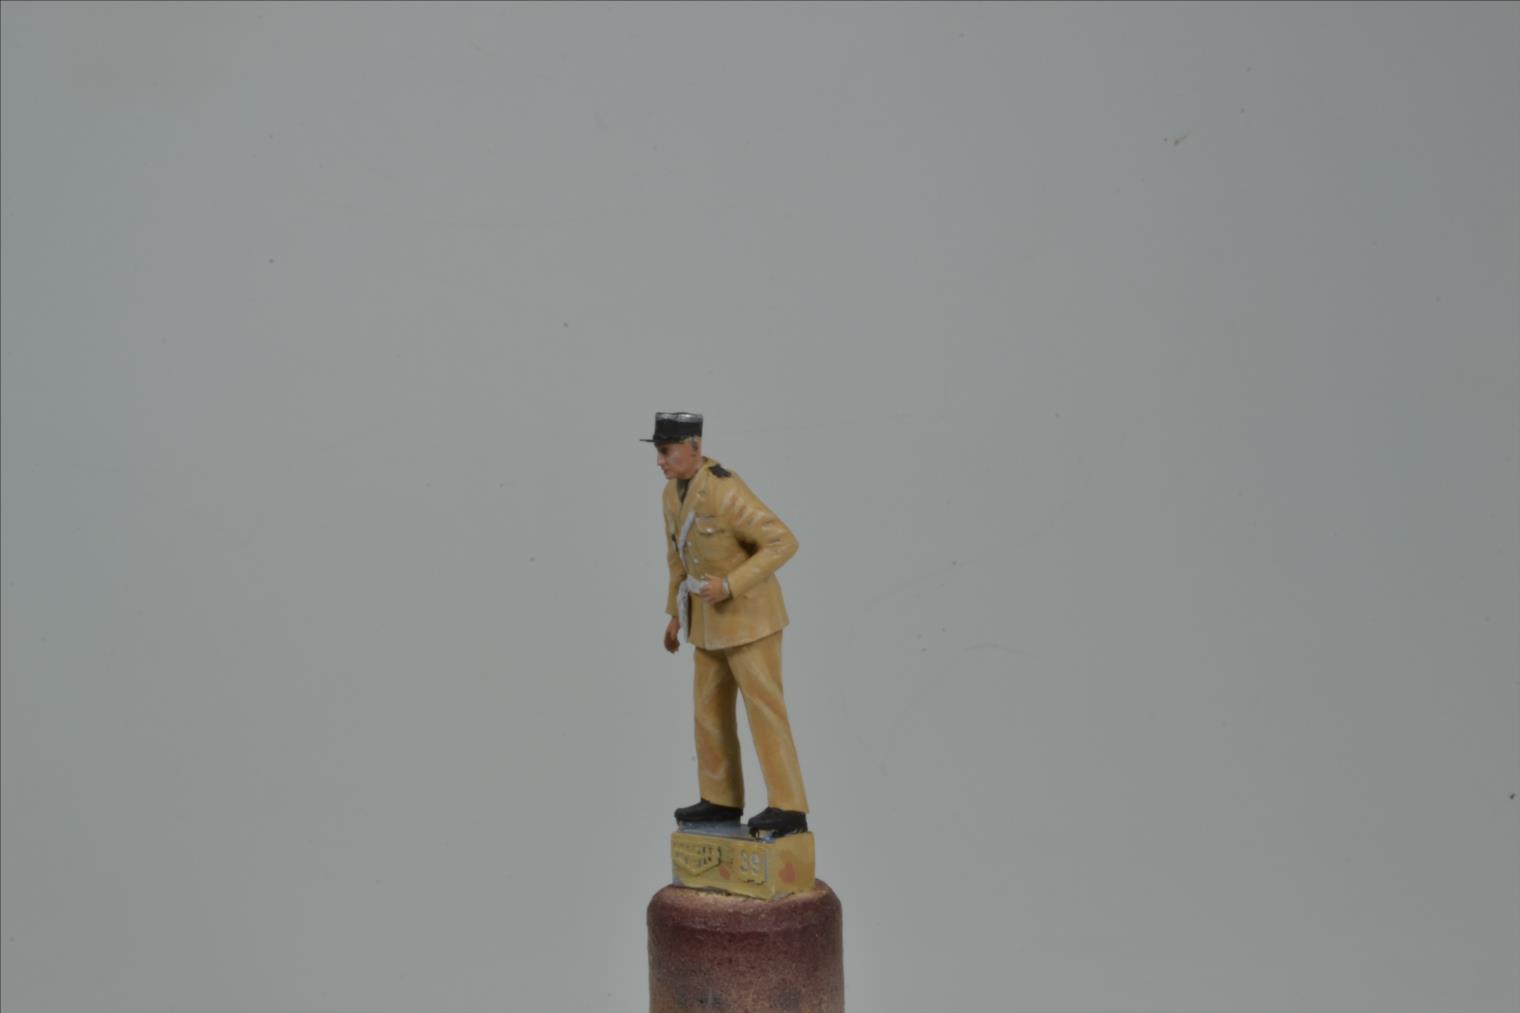 Méhari gendarme de ST TROPEZ (BALATON MODELL 1/35) 18120802524422494216029204